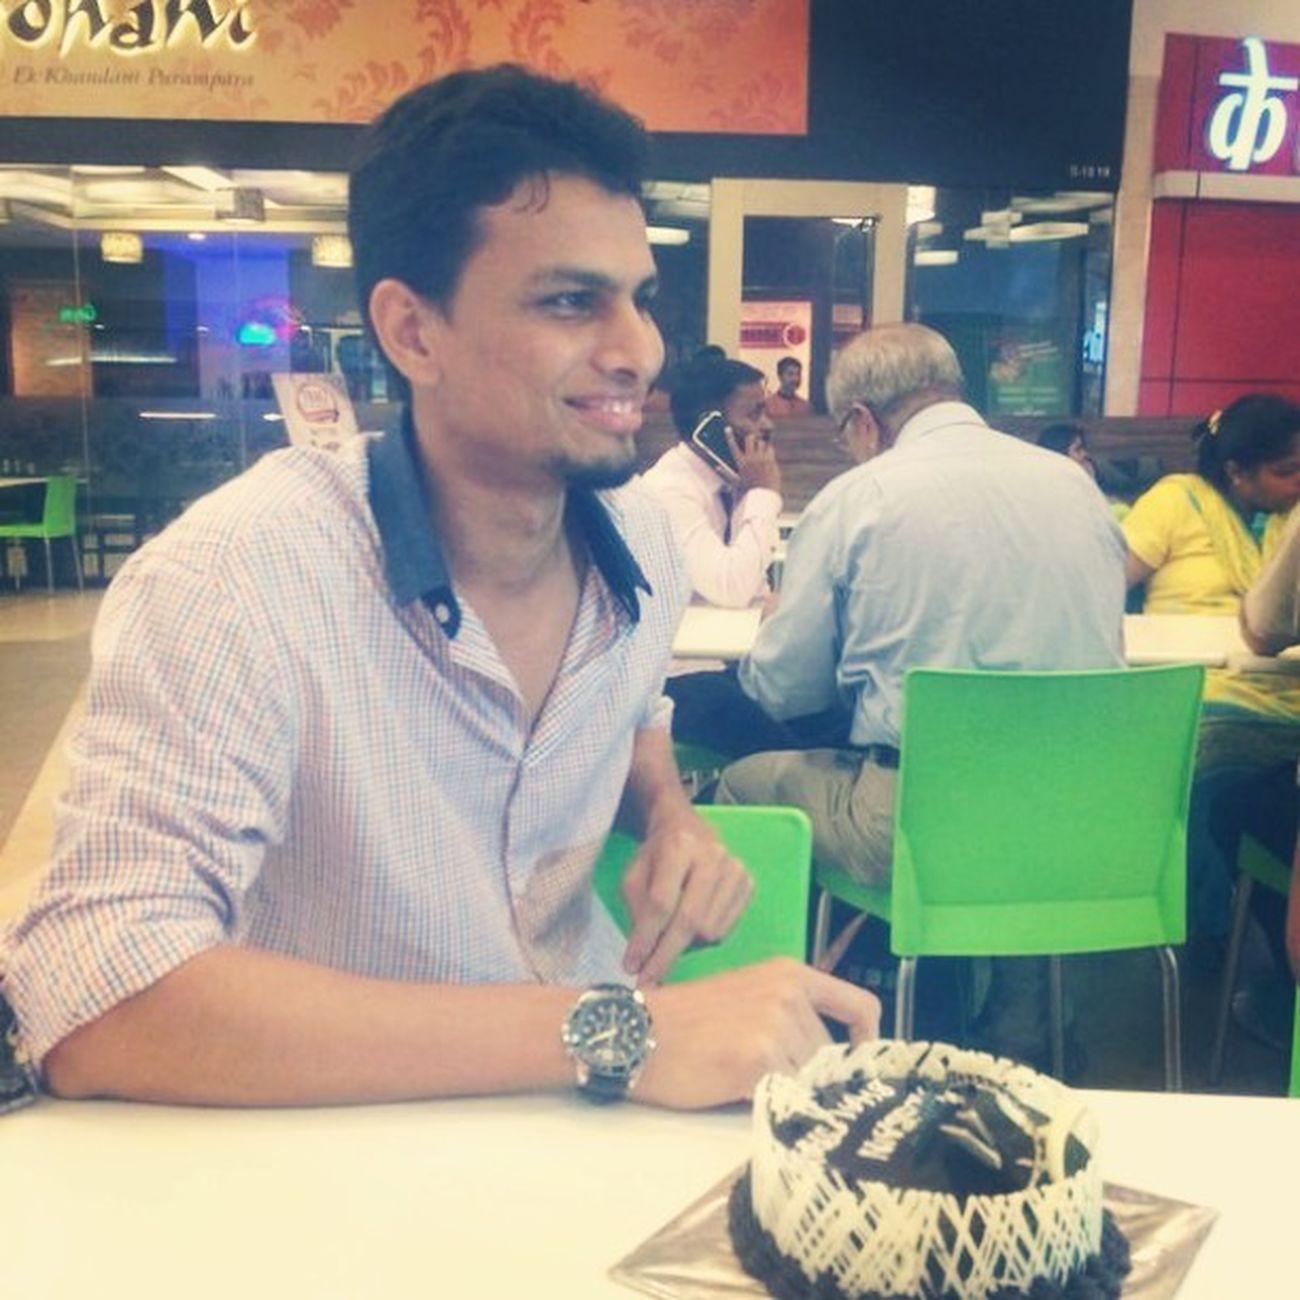 Birthday Today Itsmybirthday Thank god for such a gud frnds Iam24 24th Birthday Borntoday